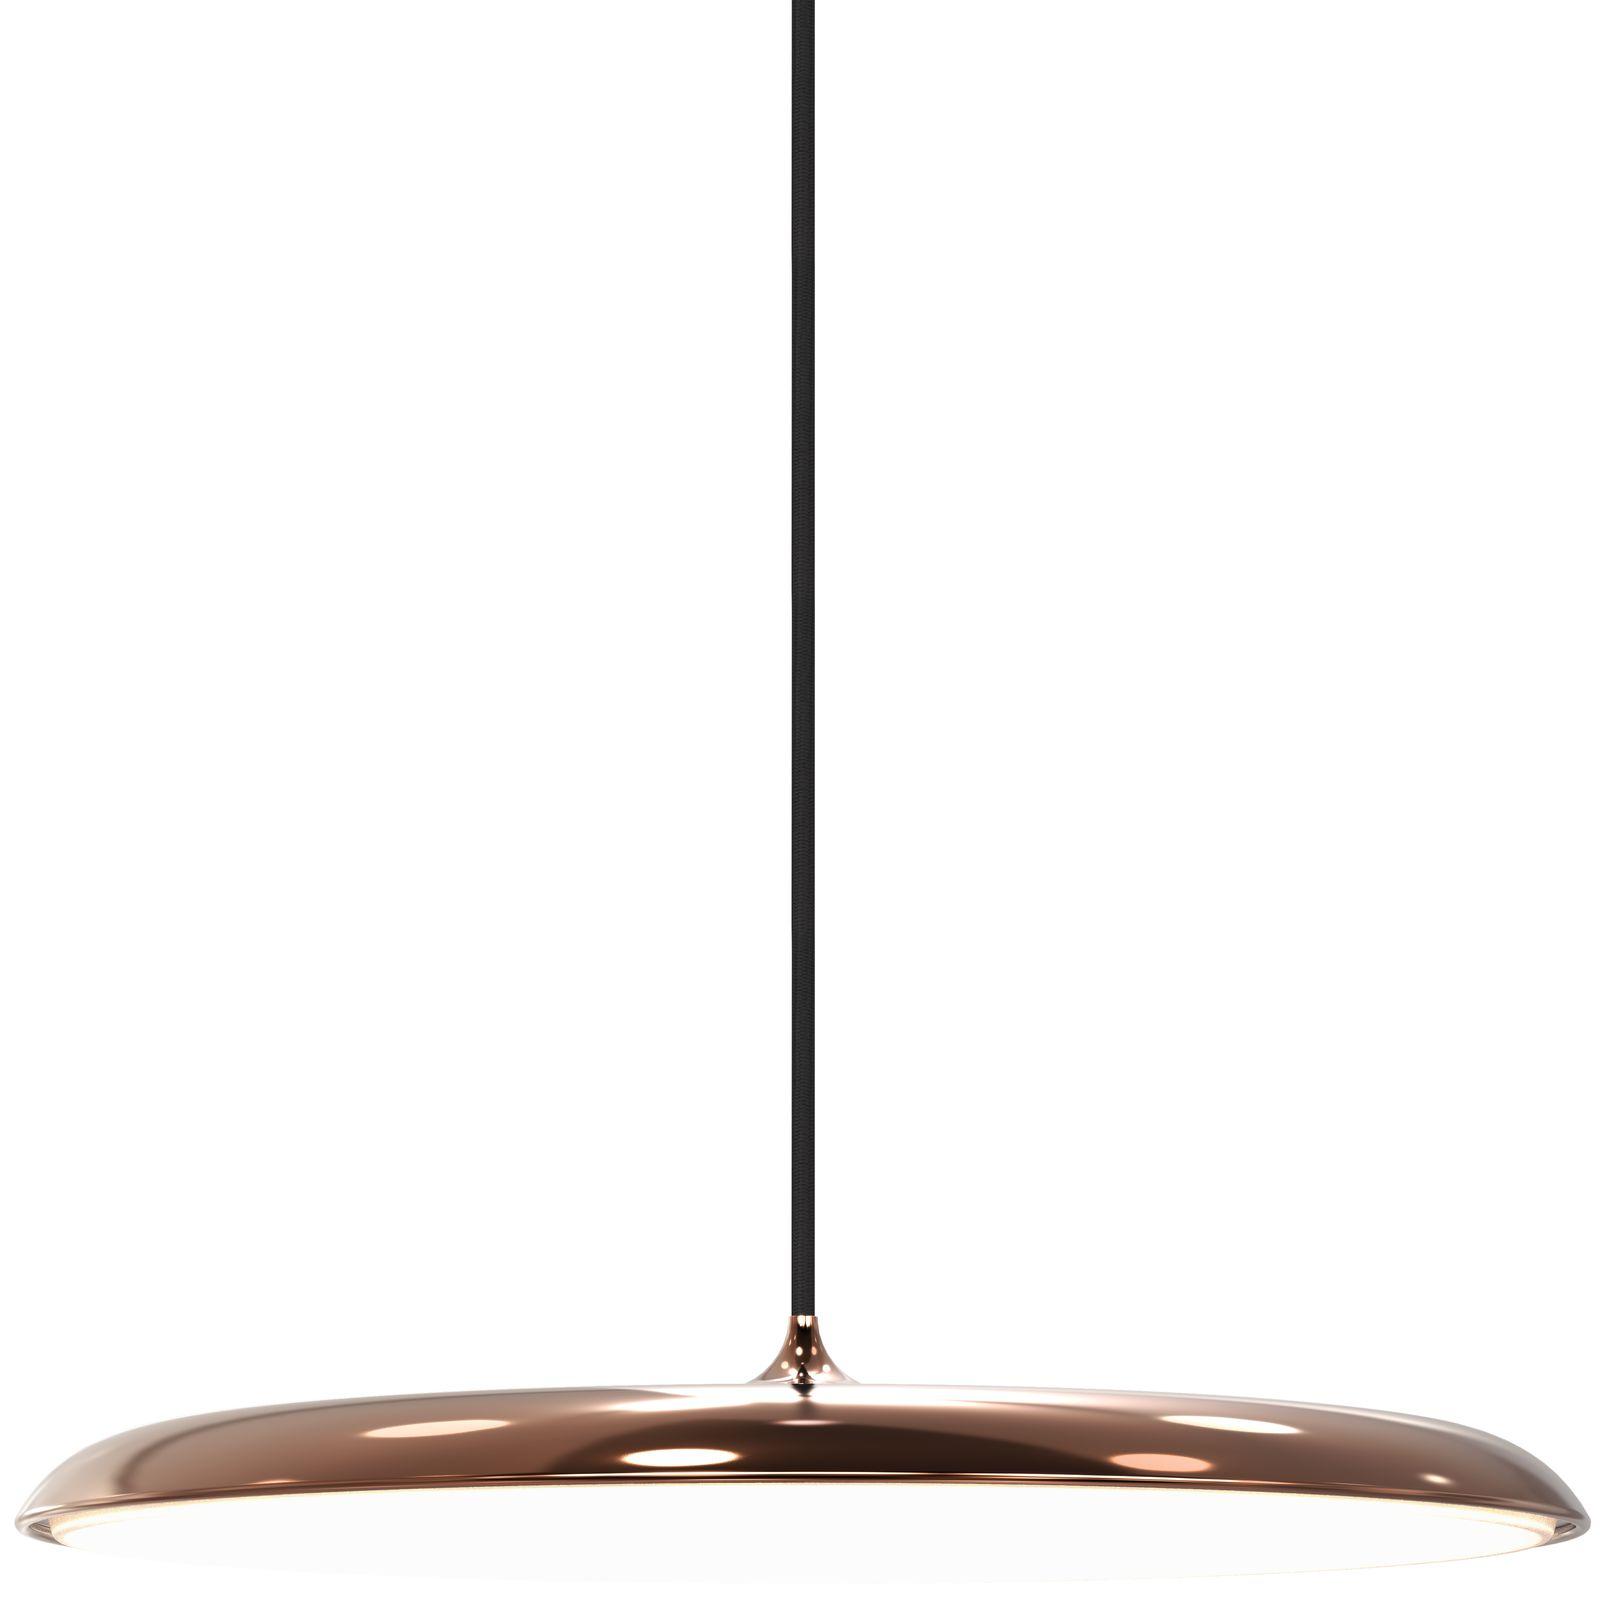 Nordlux/Design for the people Artist 40 LED pendel kobber